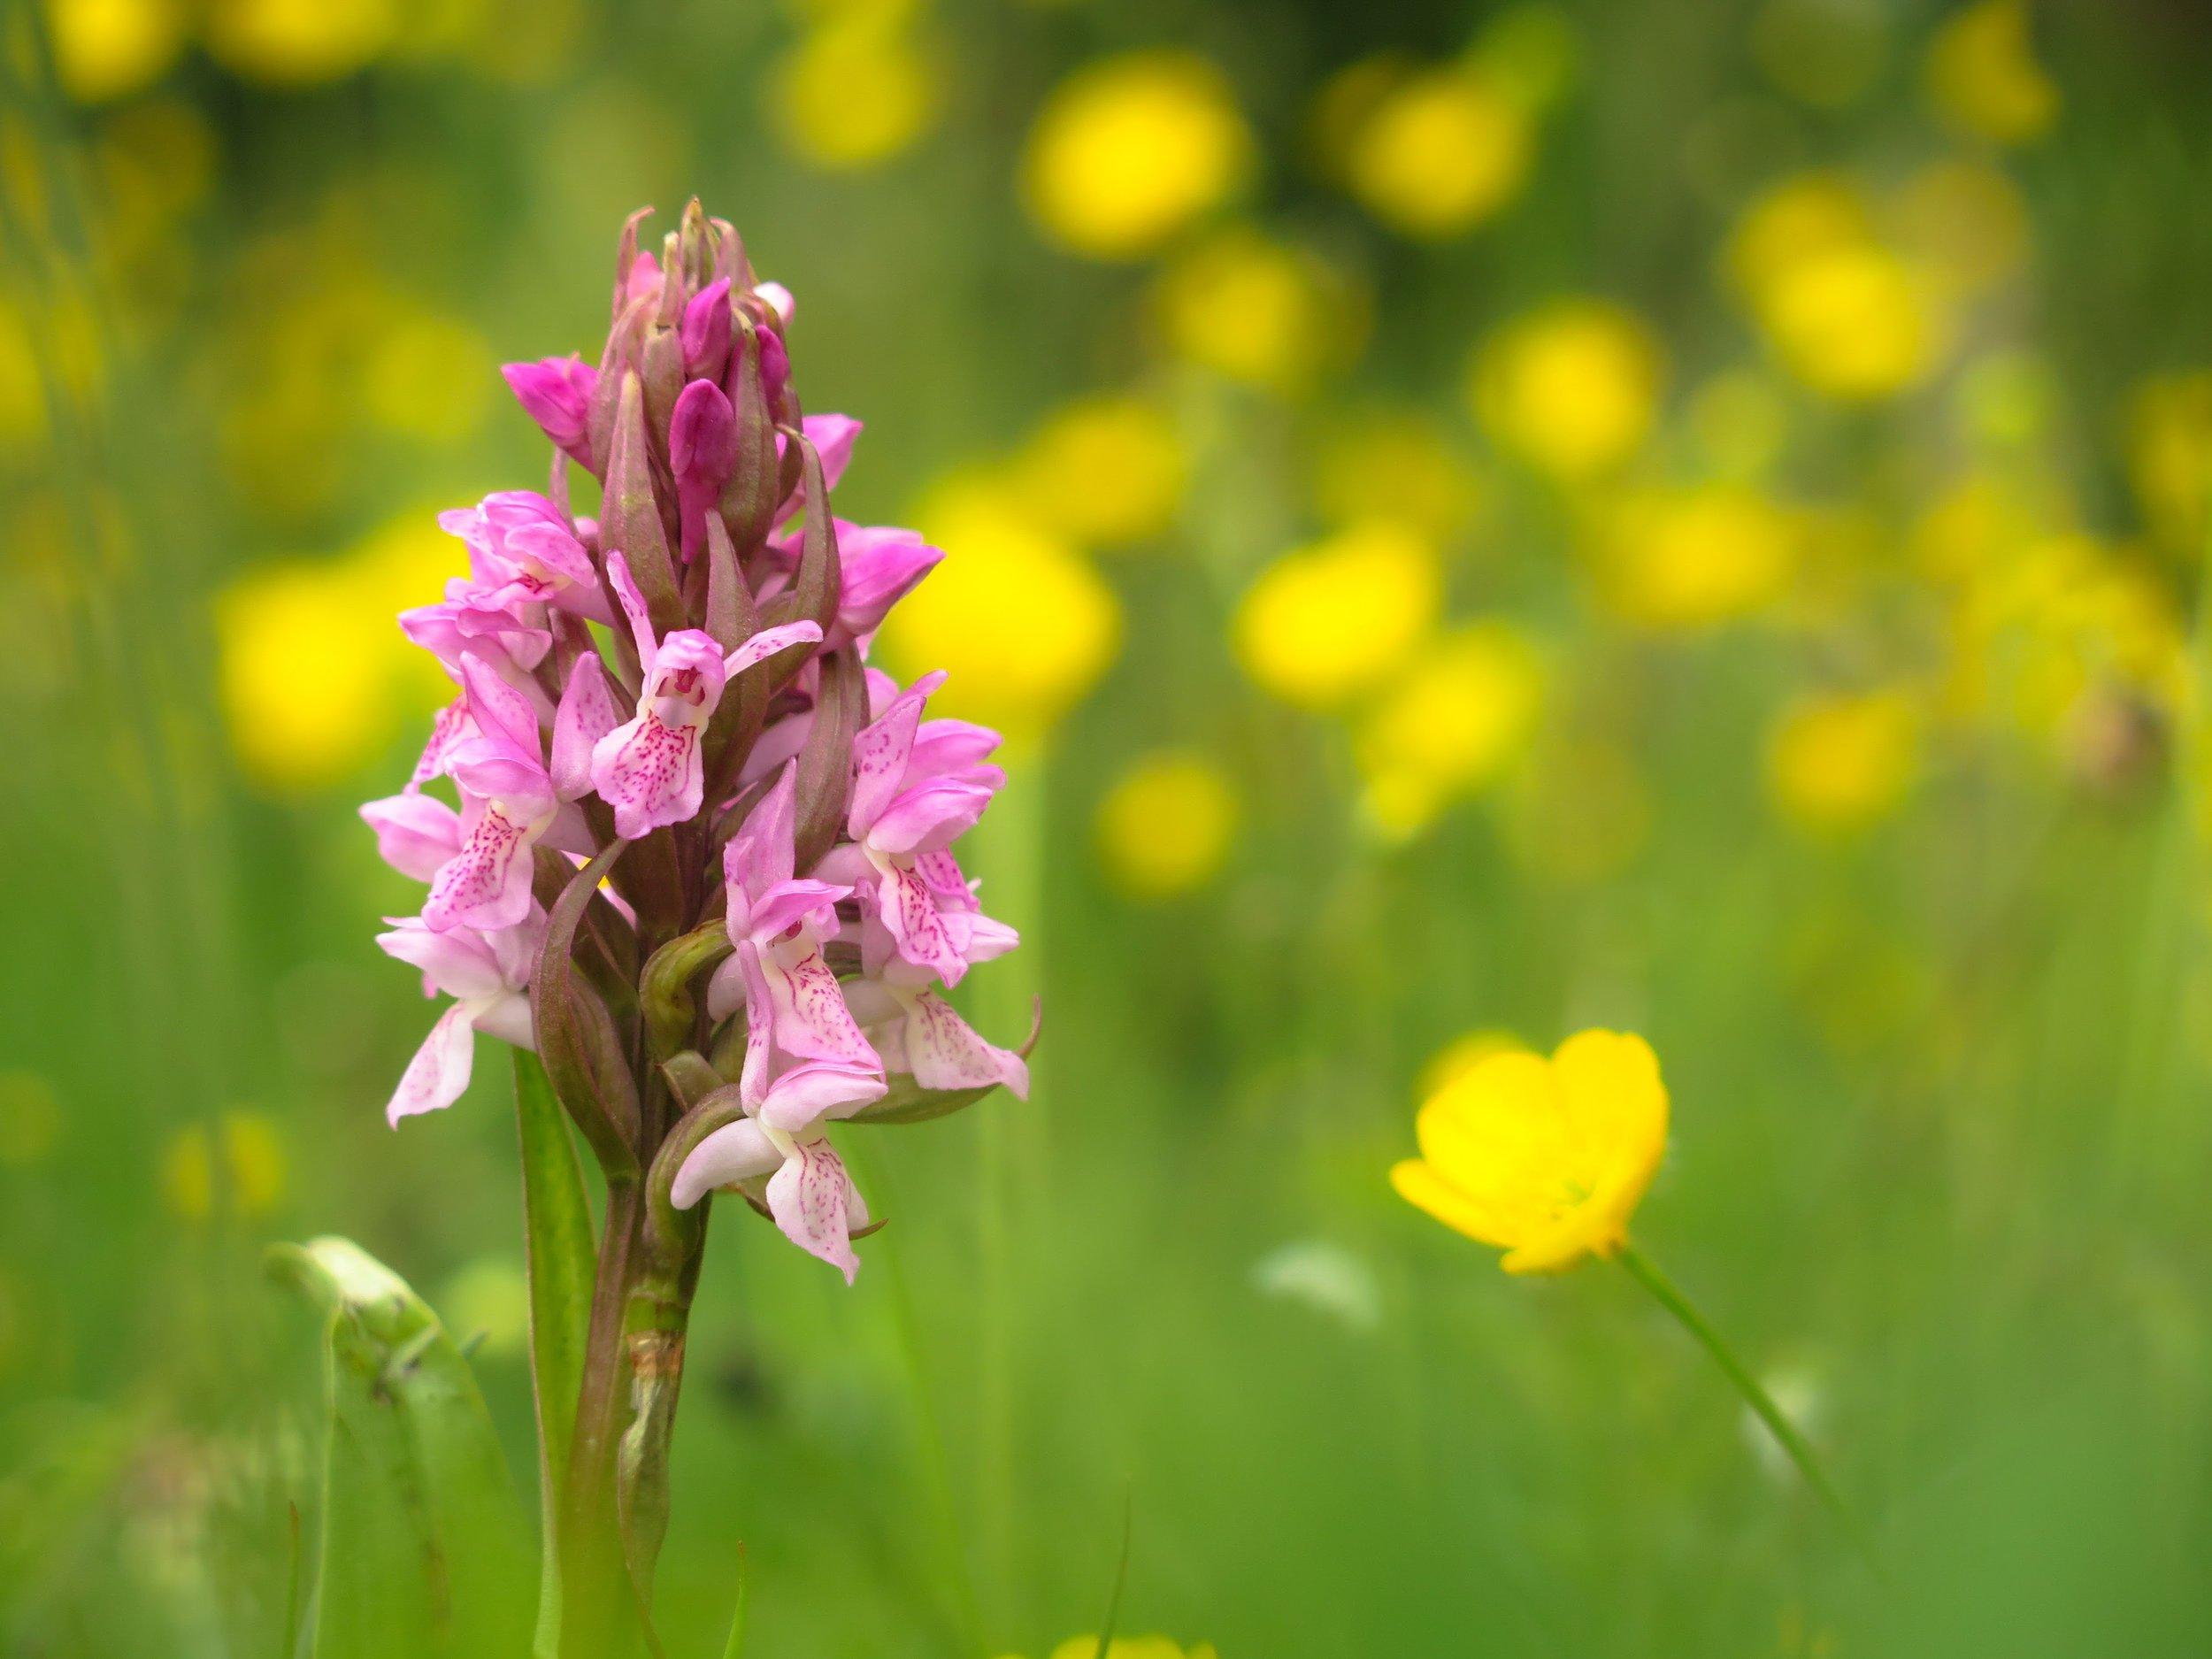 orchid distribution assessed using specailist surveys